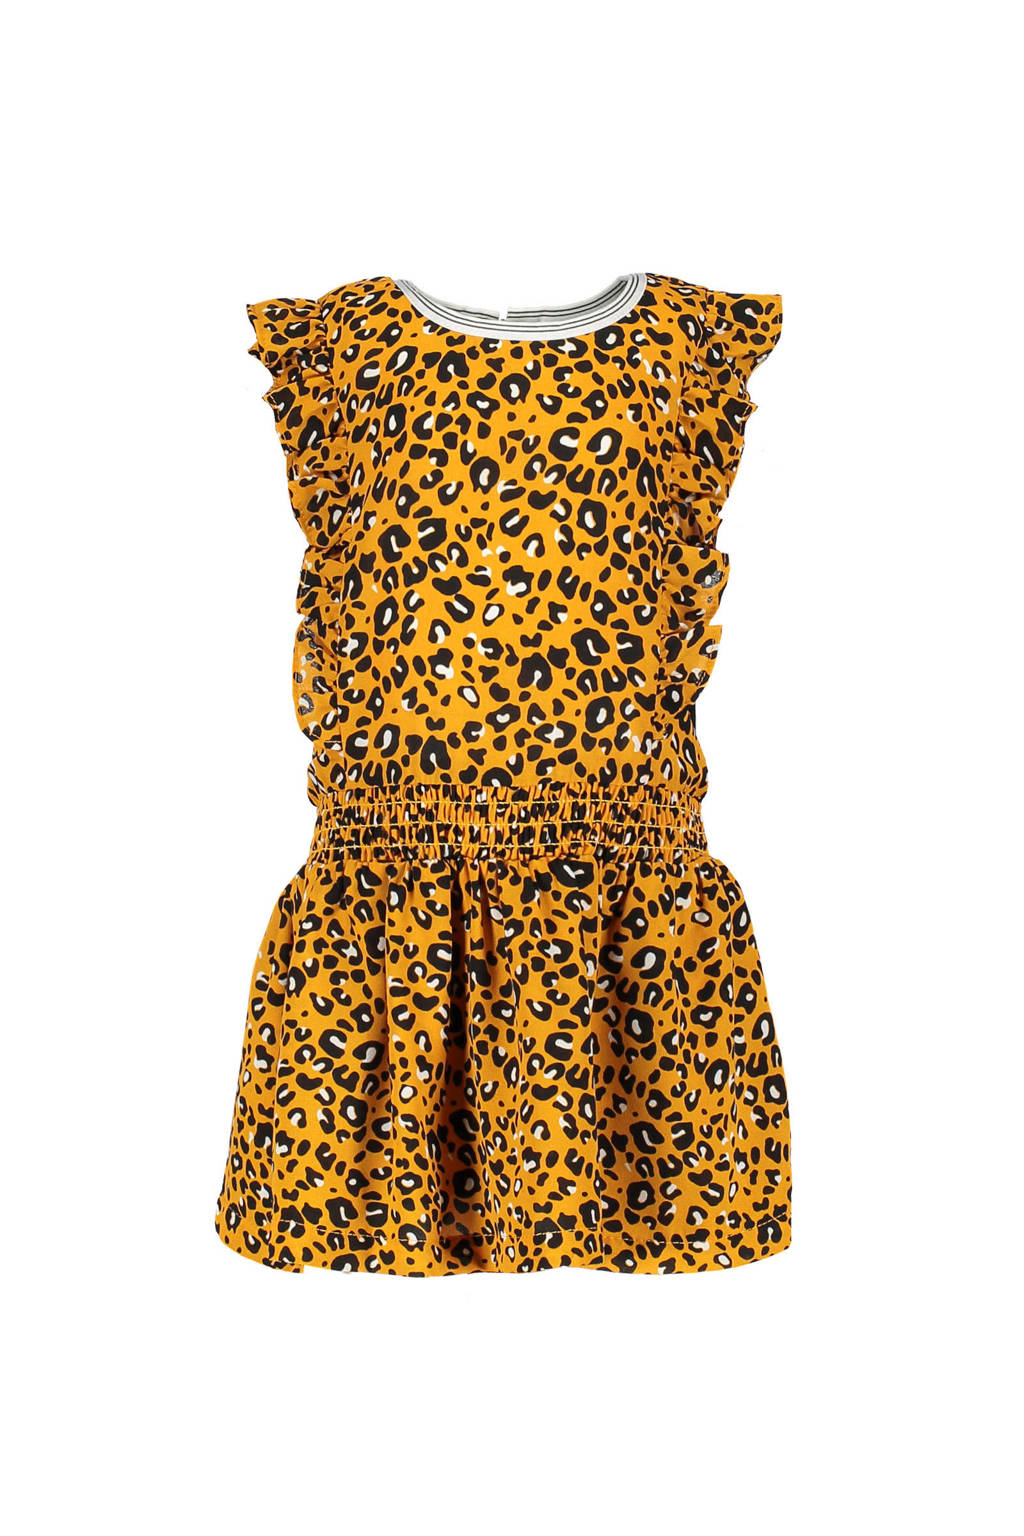 Like Flo jurk met ruches en panterprint okergeel, okergeel/zwart